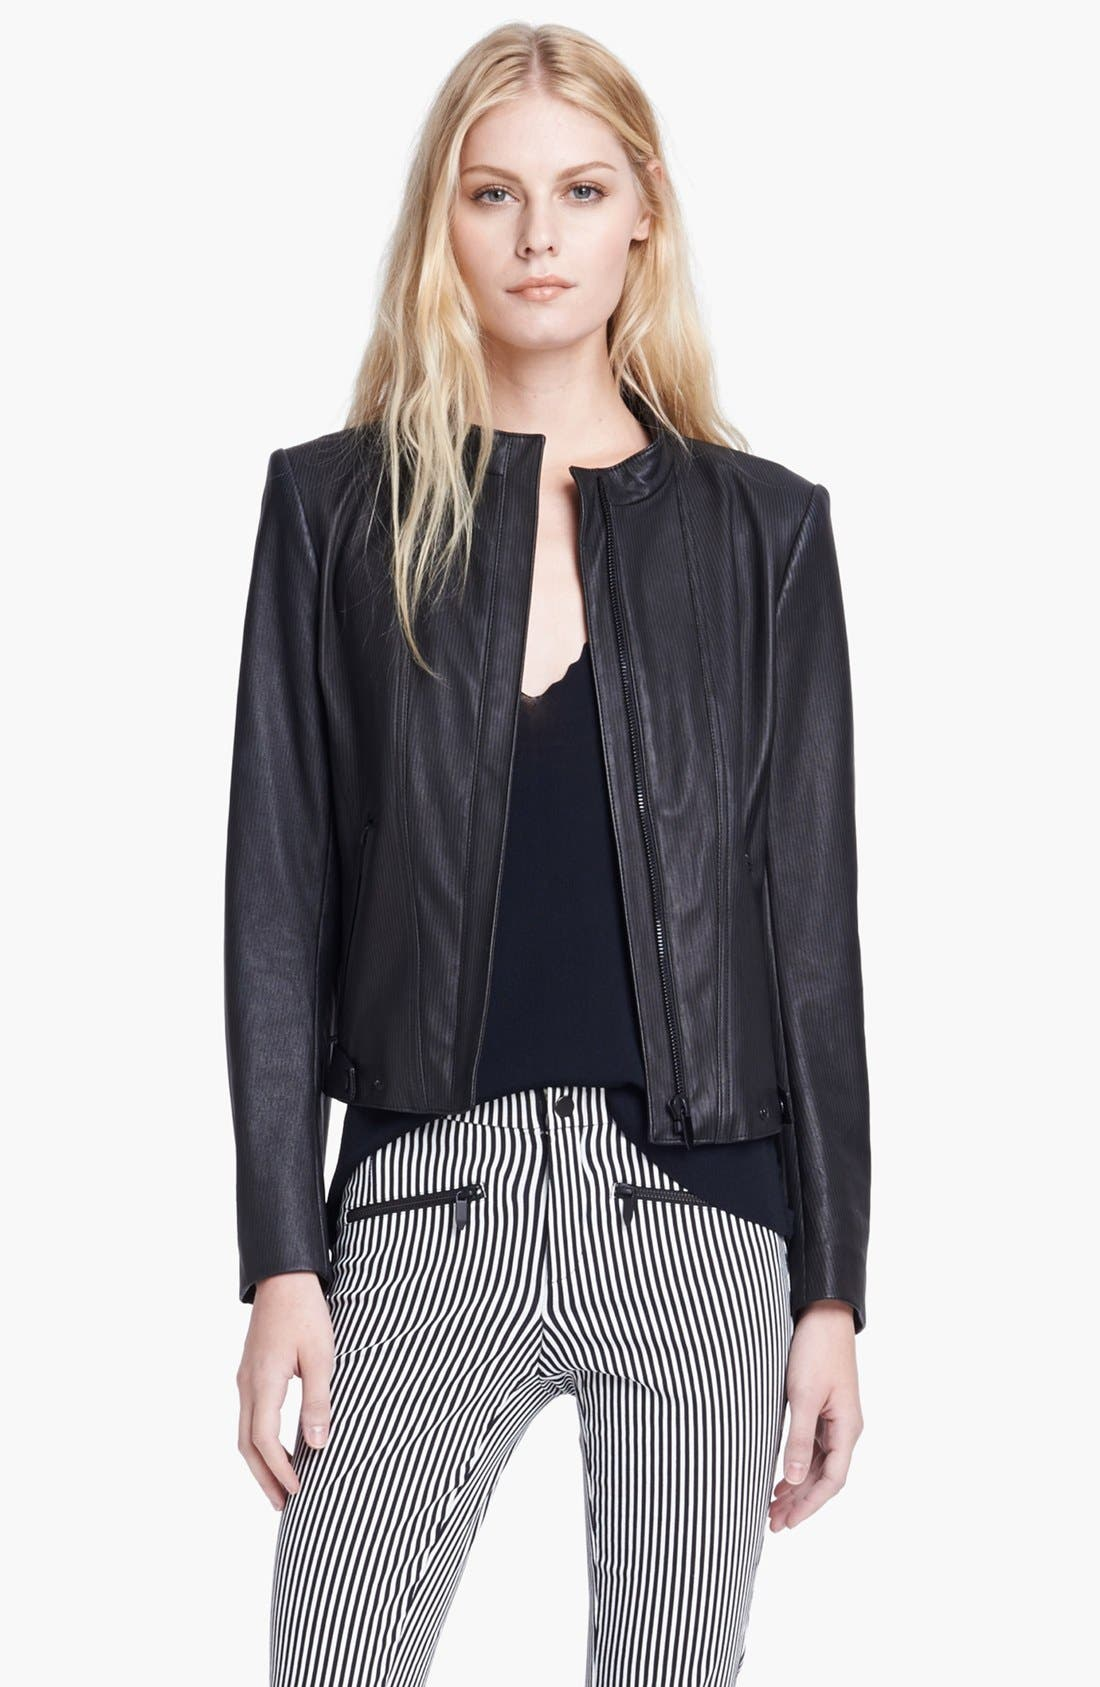 Alternate Image 1 Selected - Theyskens' Theory 'Jylan Netch' Stripe Leather Jacket